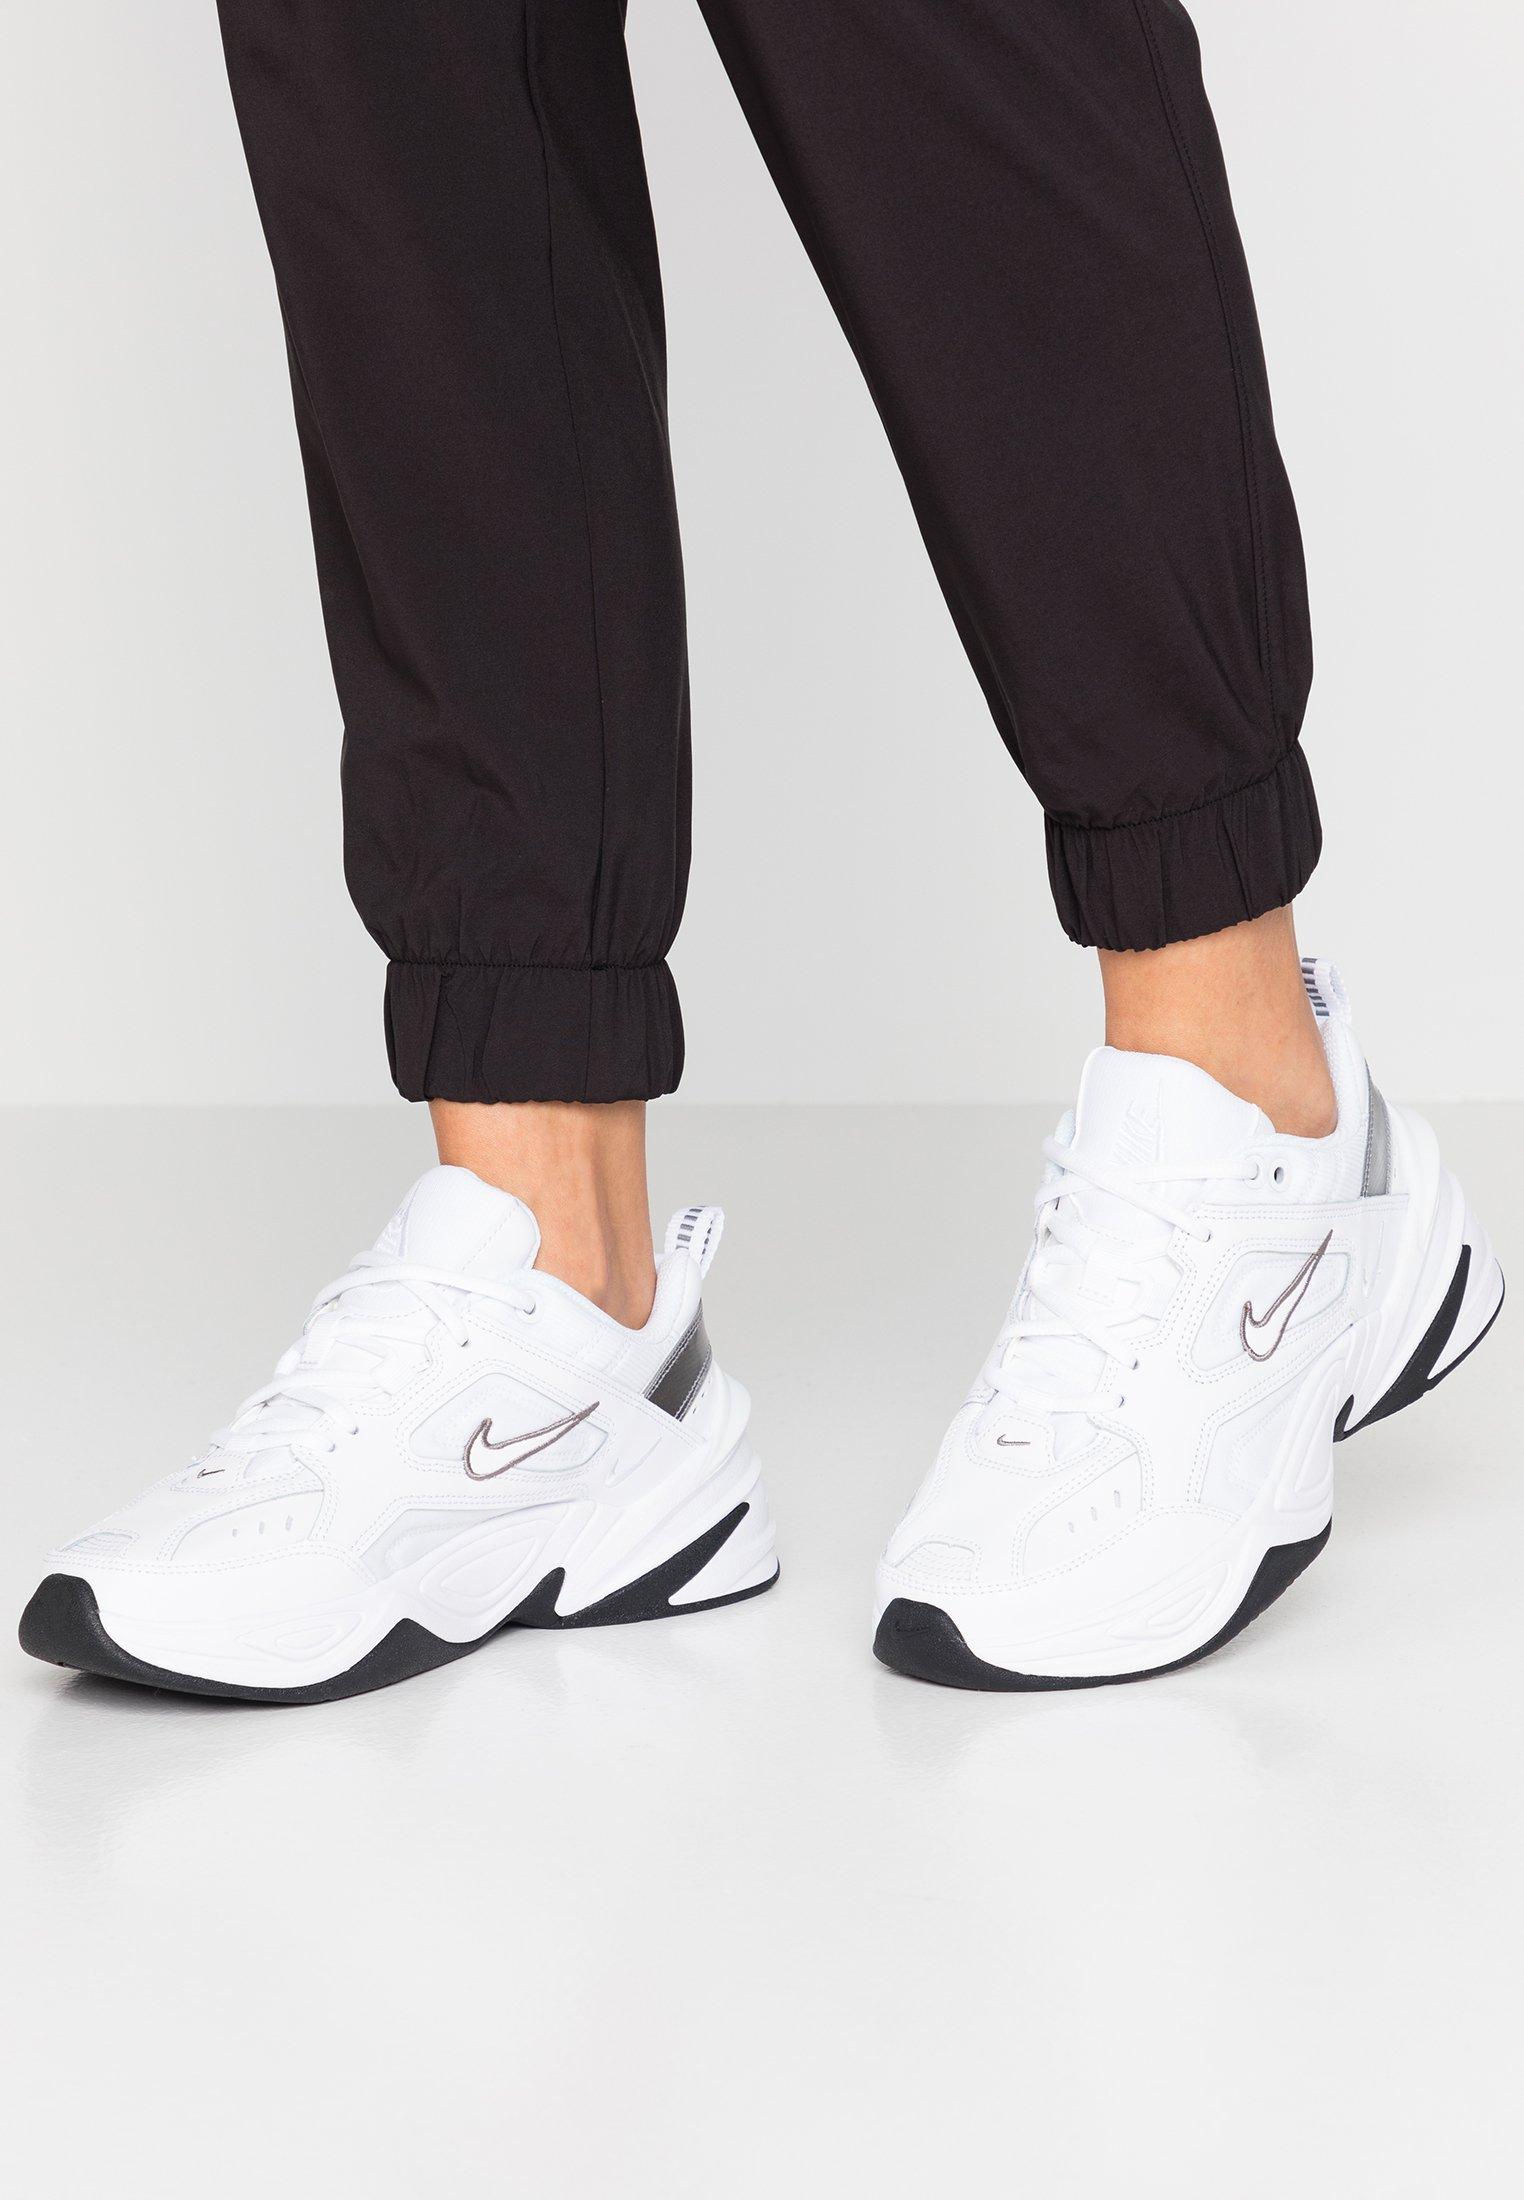 Ladrillo panel Seminario  Nike Sportswear M2K TEKNO - Trainers - white/cool grey/black/white - Zalando .co.uk